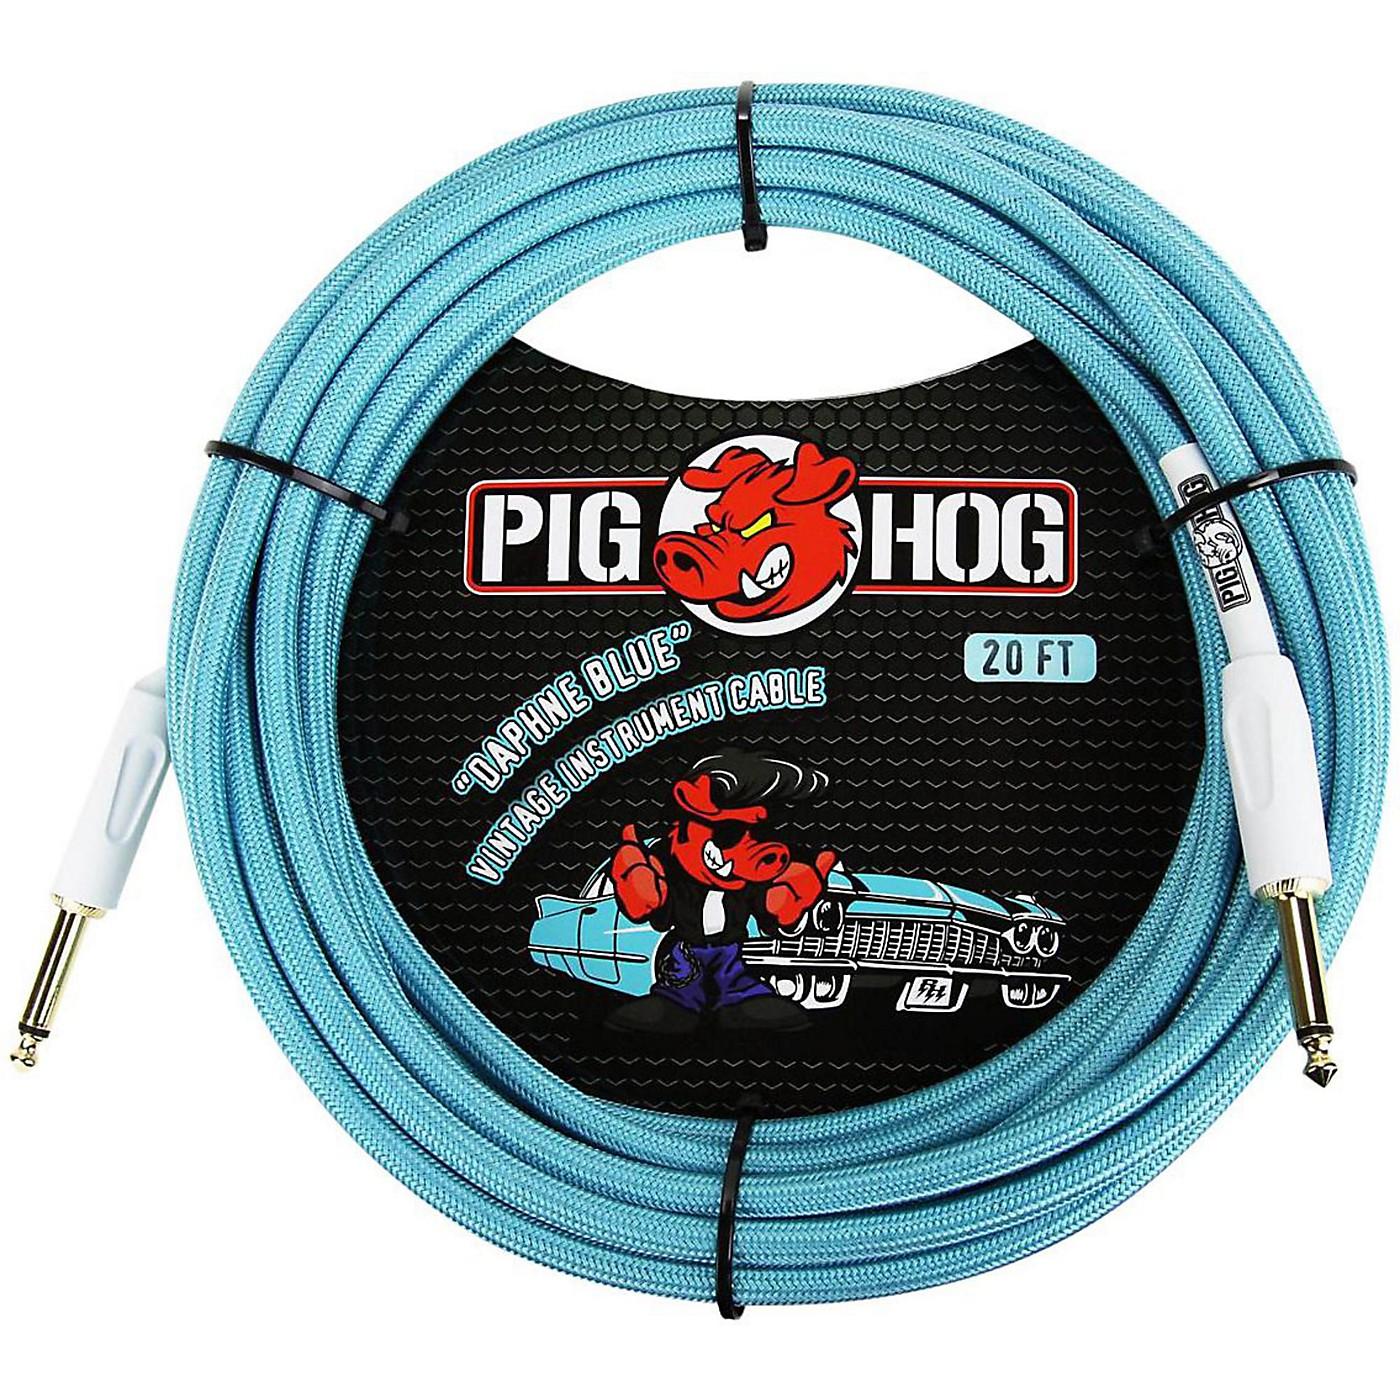 Pig Hog Instrument Cable thumbnail